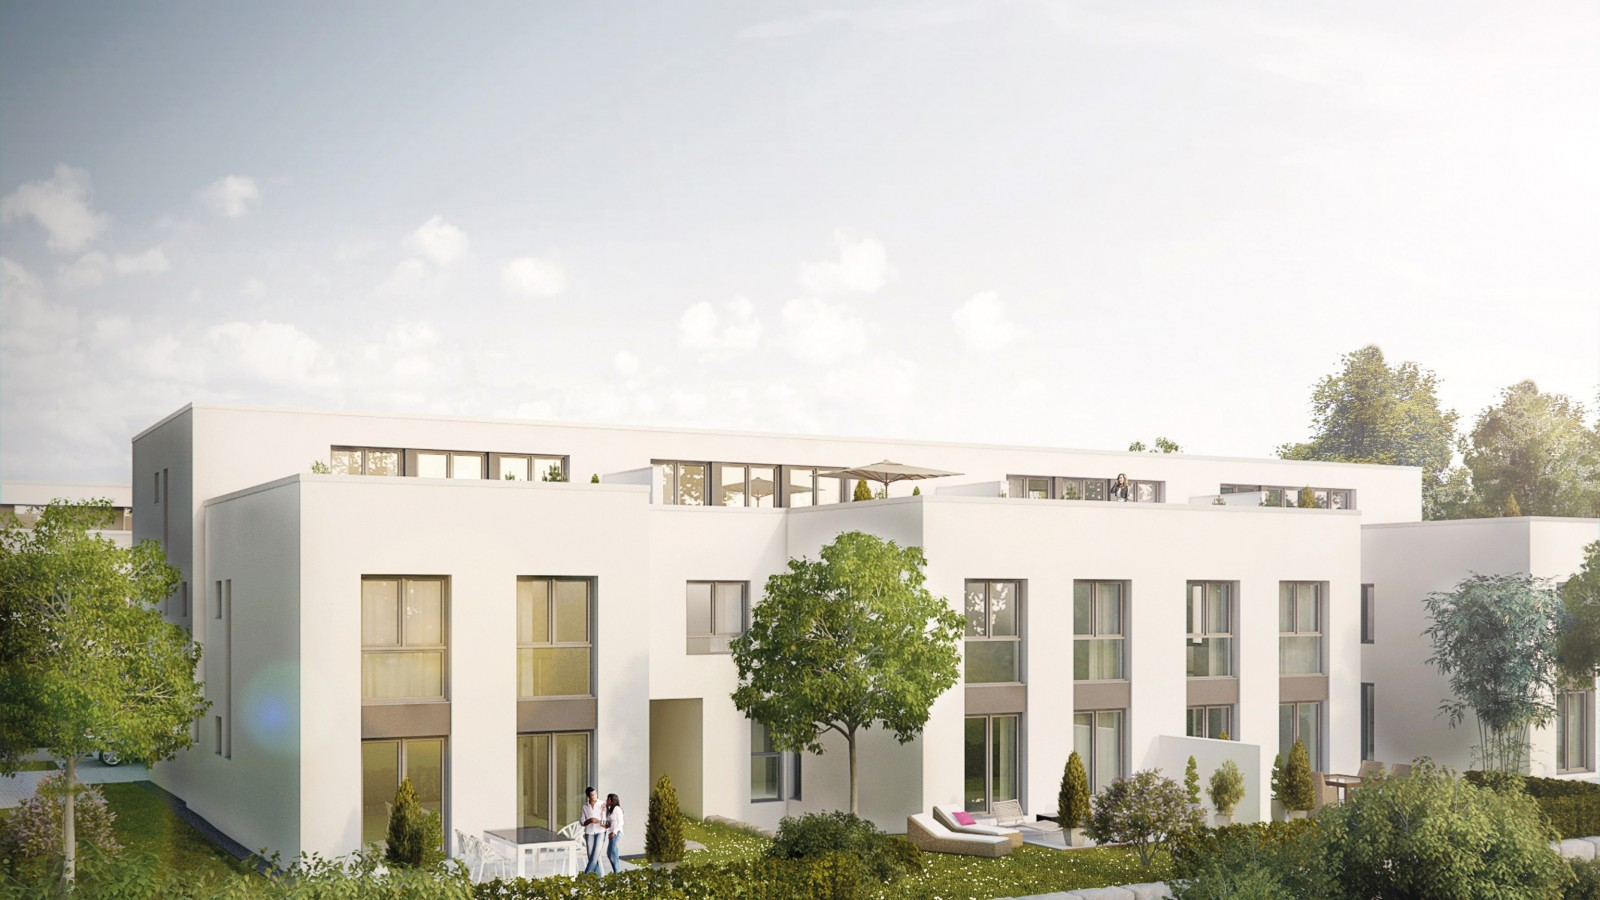 Optimal Wohnbau: Pick-Up-Haus - Bauträger in Heilbronn